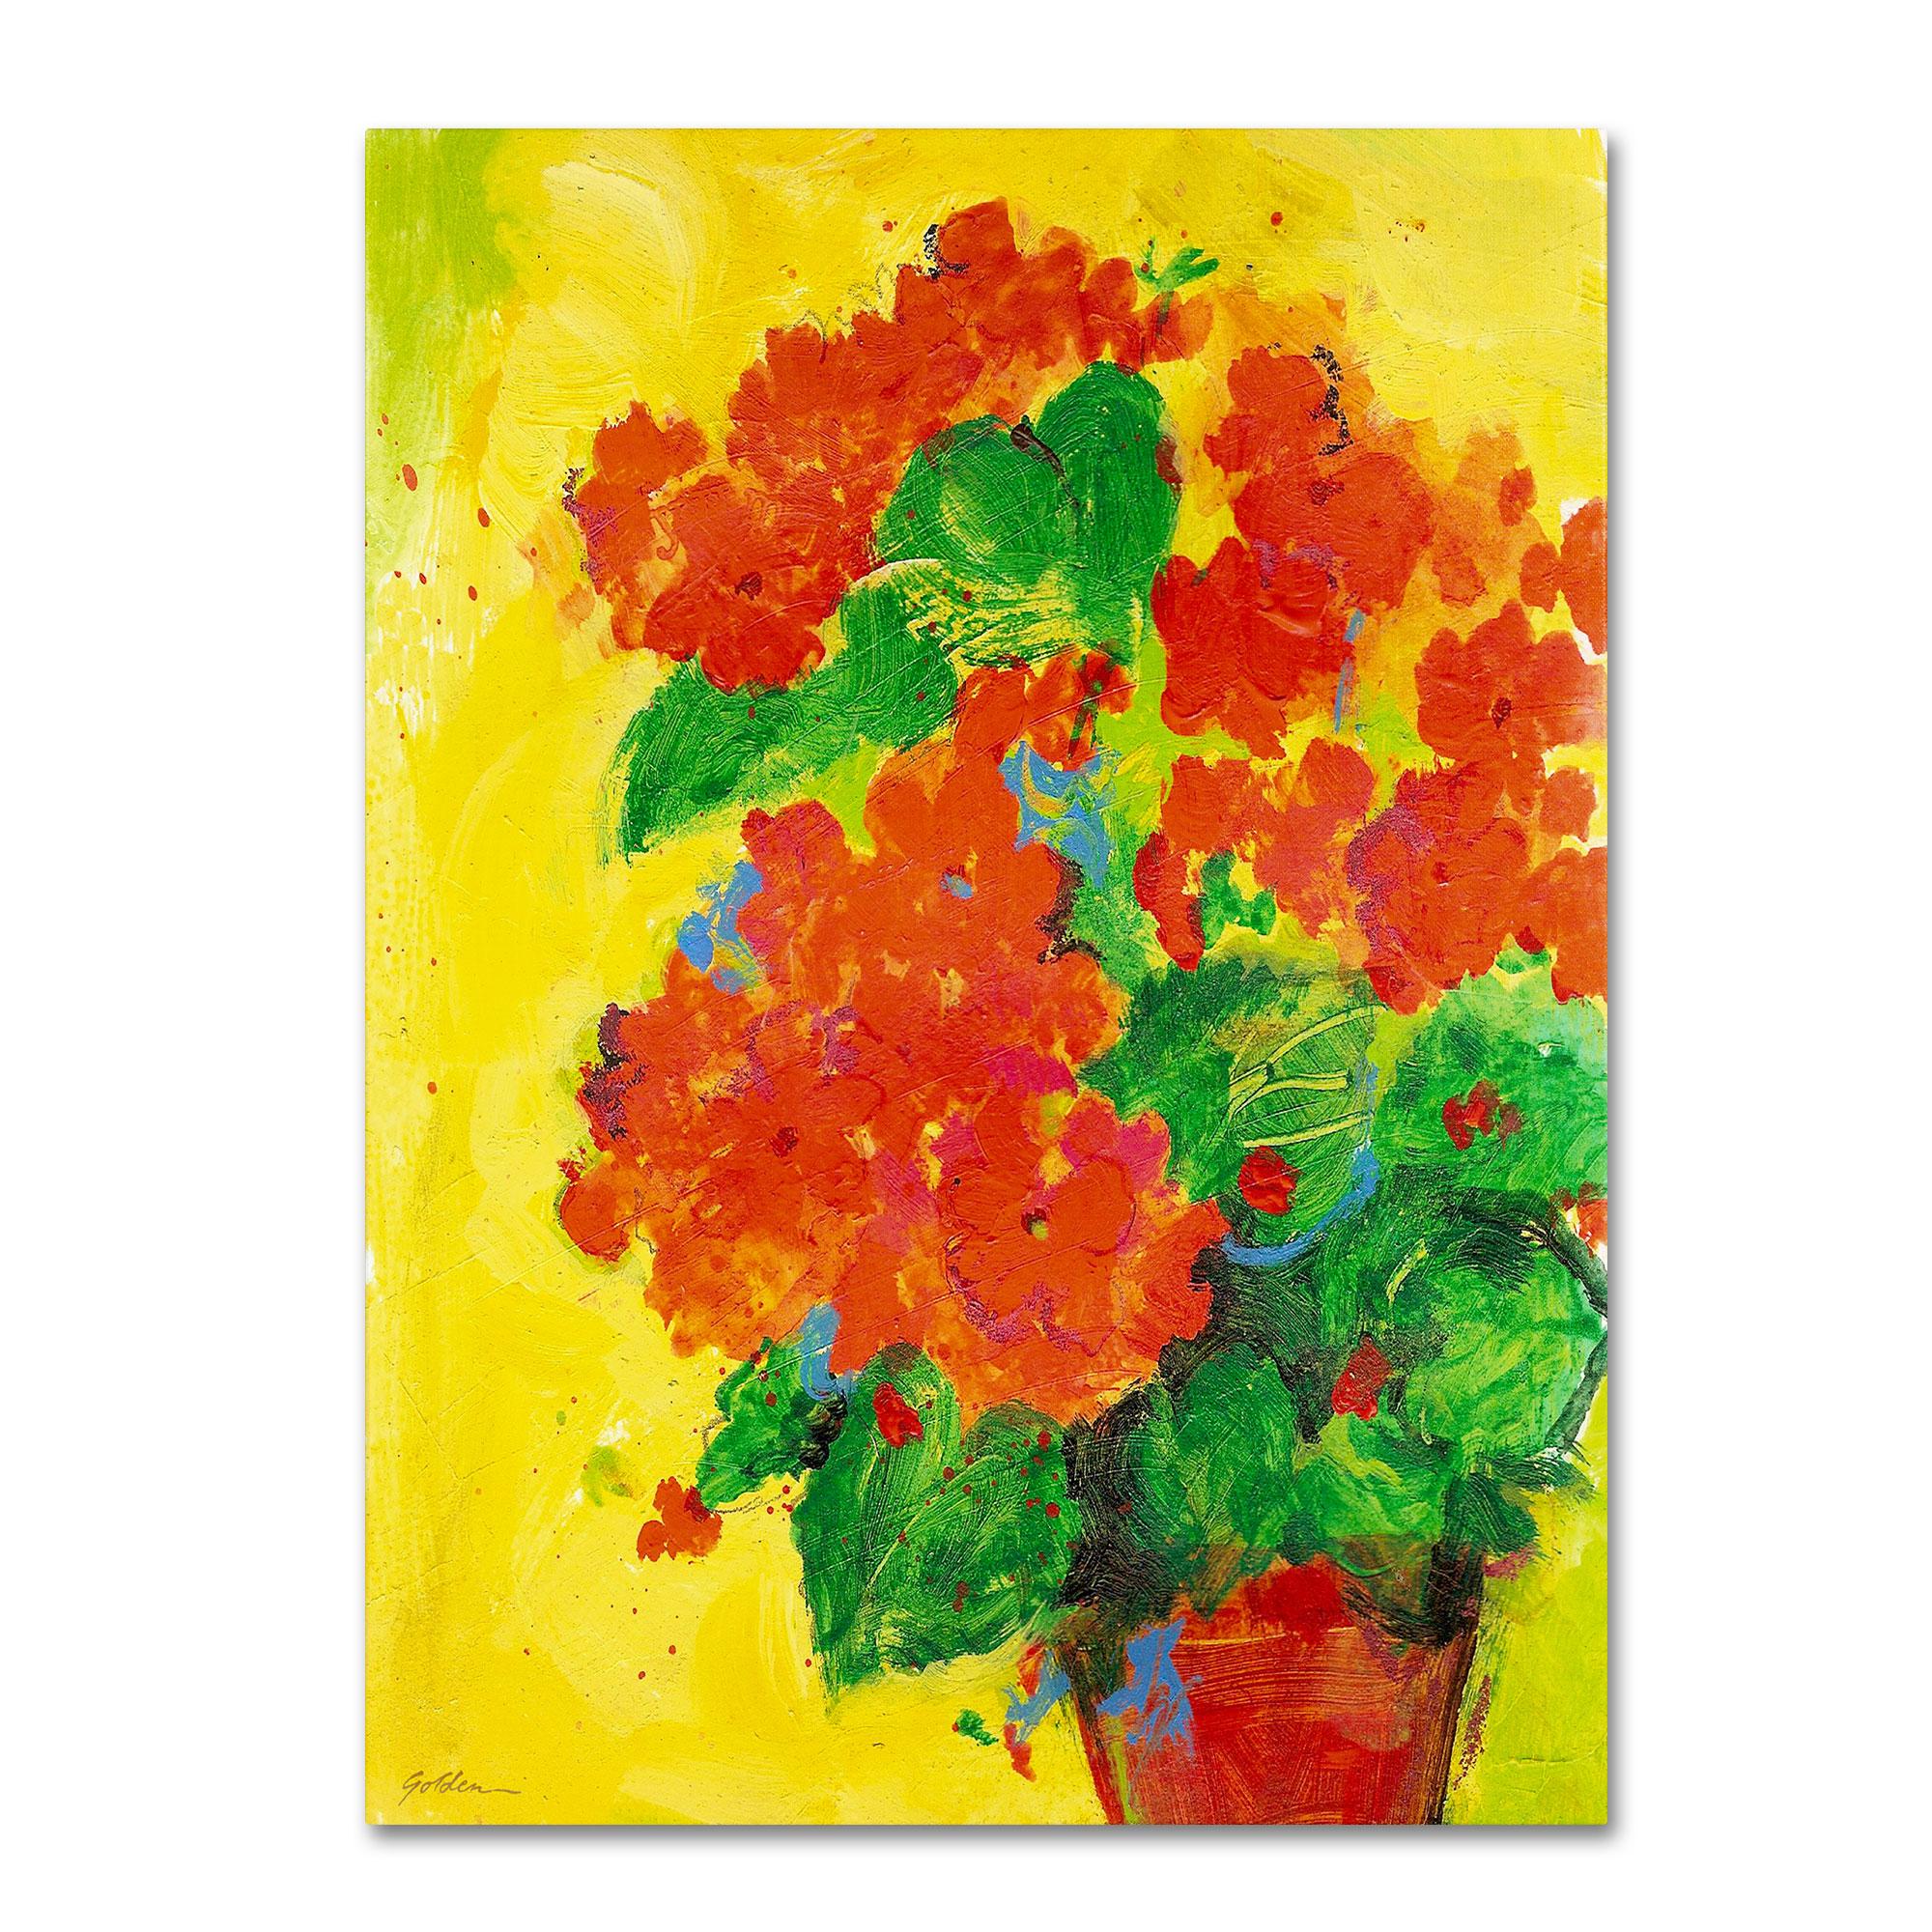 Trademark Global Sheila Golden 'Geraniums Against Yellow' Canvas Art PartNumber: 021V004806034000P KsnValue: 4806034 MfgPartNumber: SG5706-C3547GG